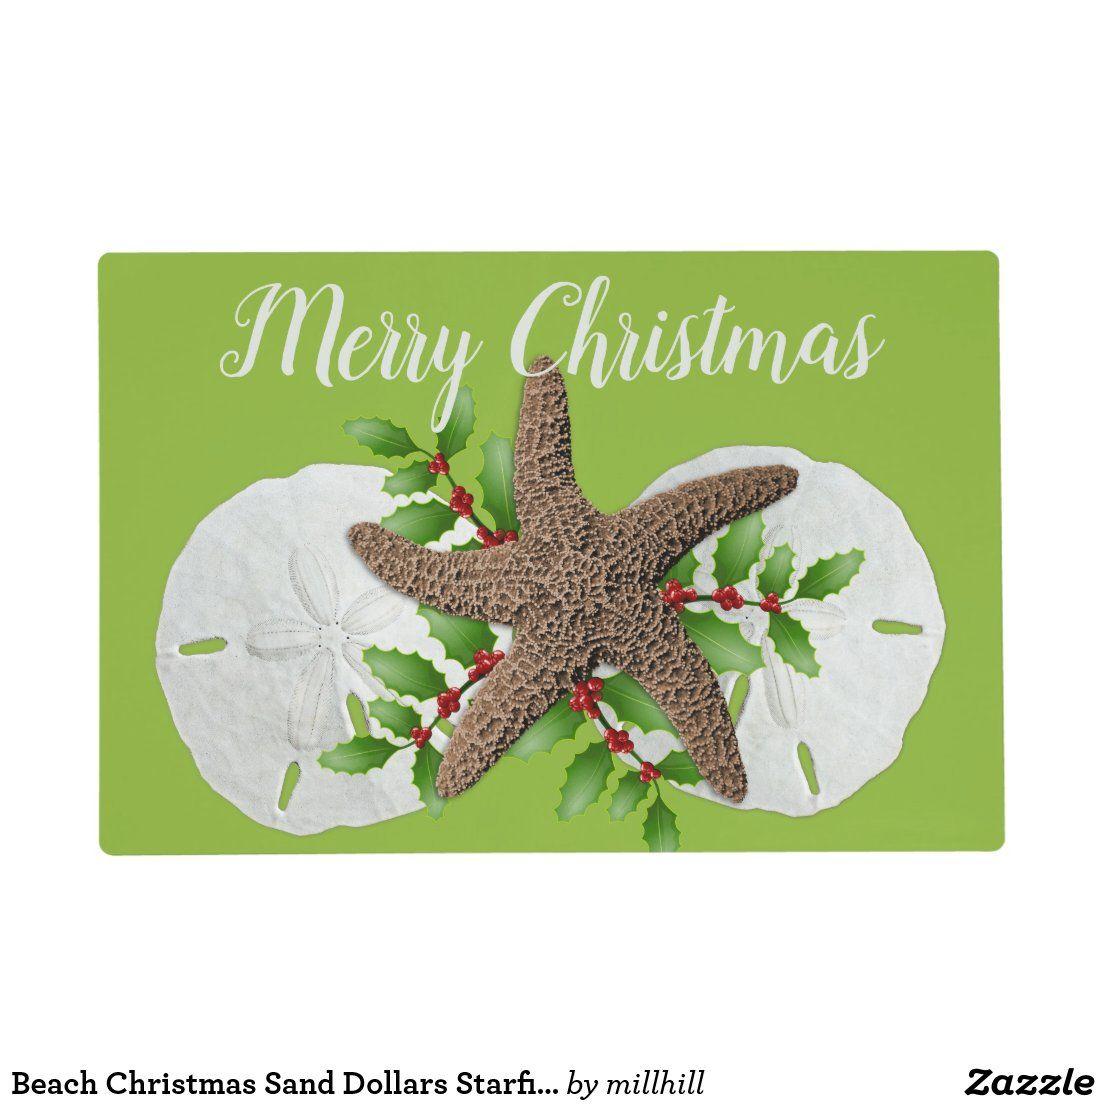 Beach Christmas Sand Dollars Starfish Laminated Placemat Zazzle Com Beach Christmas Christmas Placemats Custom Placemats